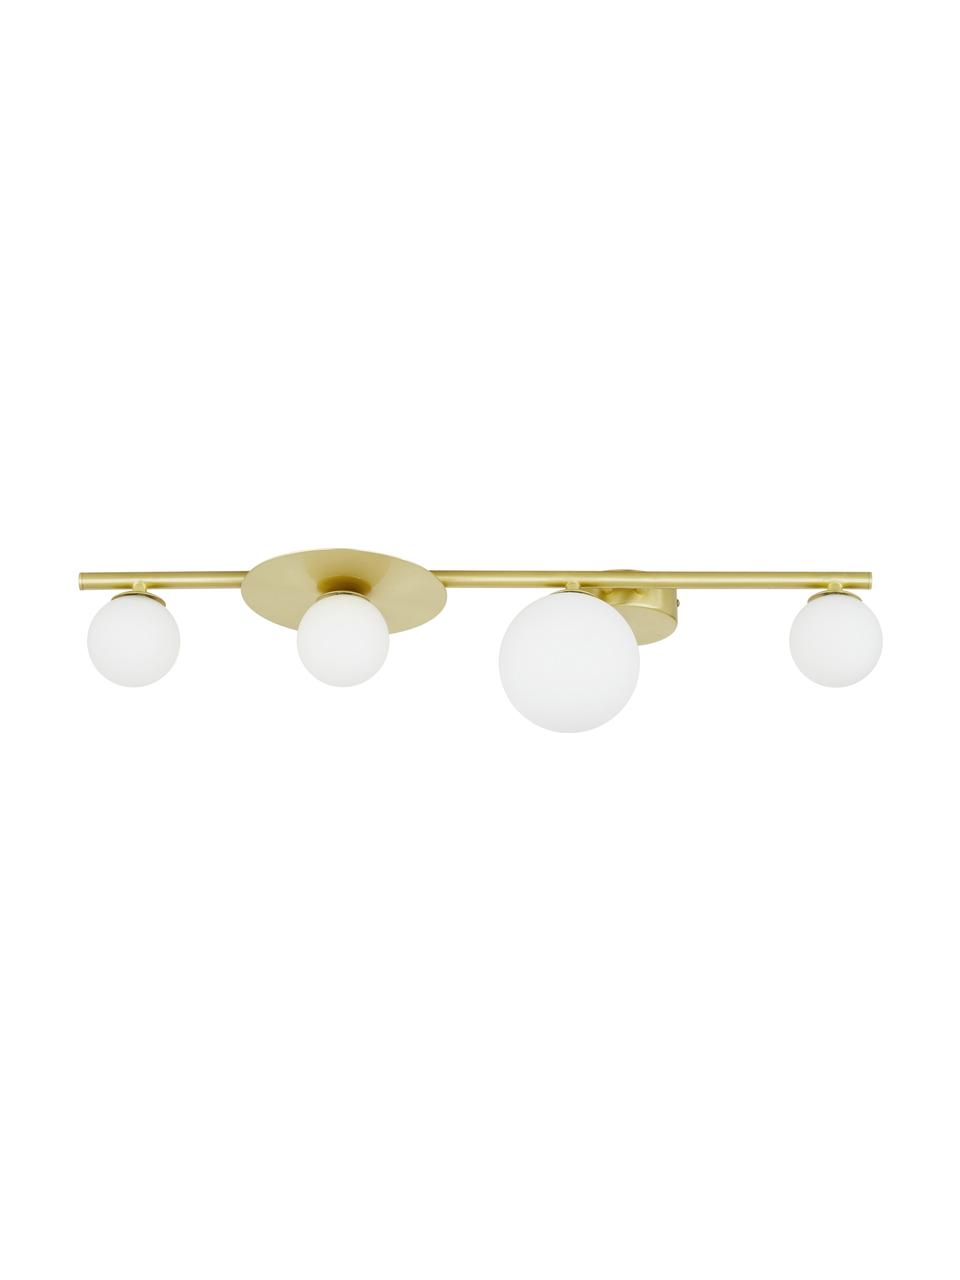 Plafondlamp Ciara van opaalglas, Baldakijn: vermessingd metaal, Baldakijn en fitting: mat messingkleurig. Lampenkappen: wit, 69 x 16 cm